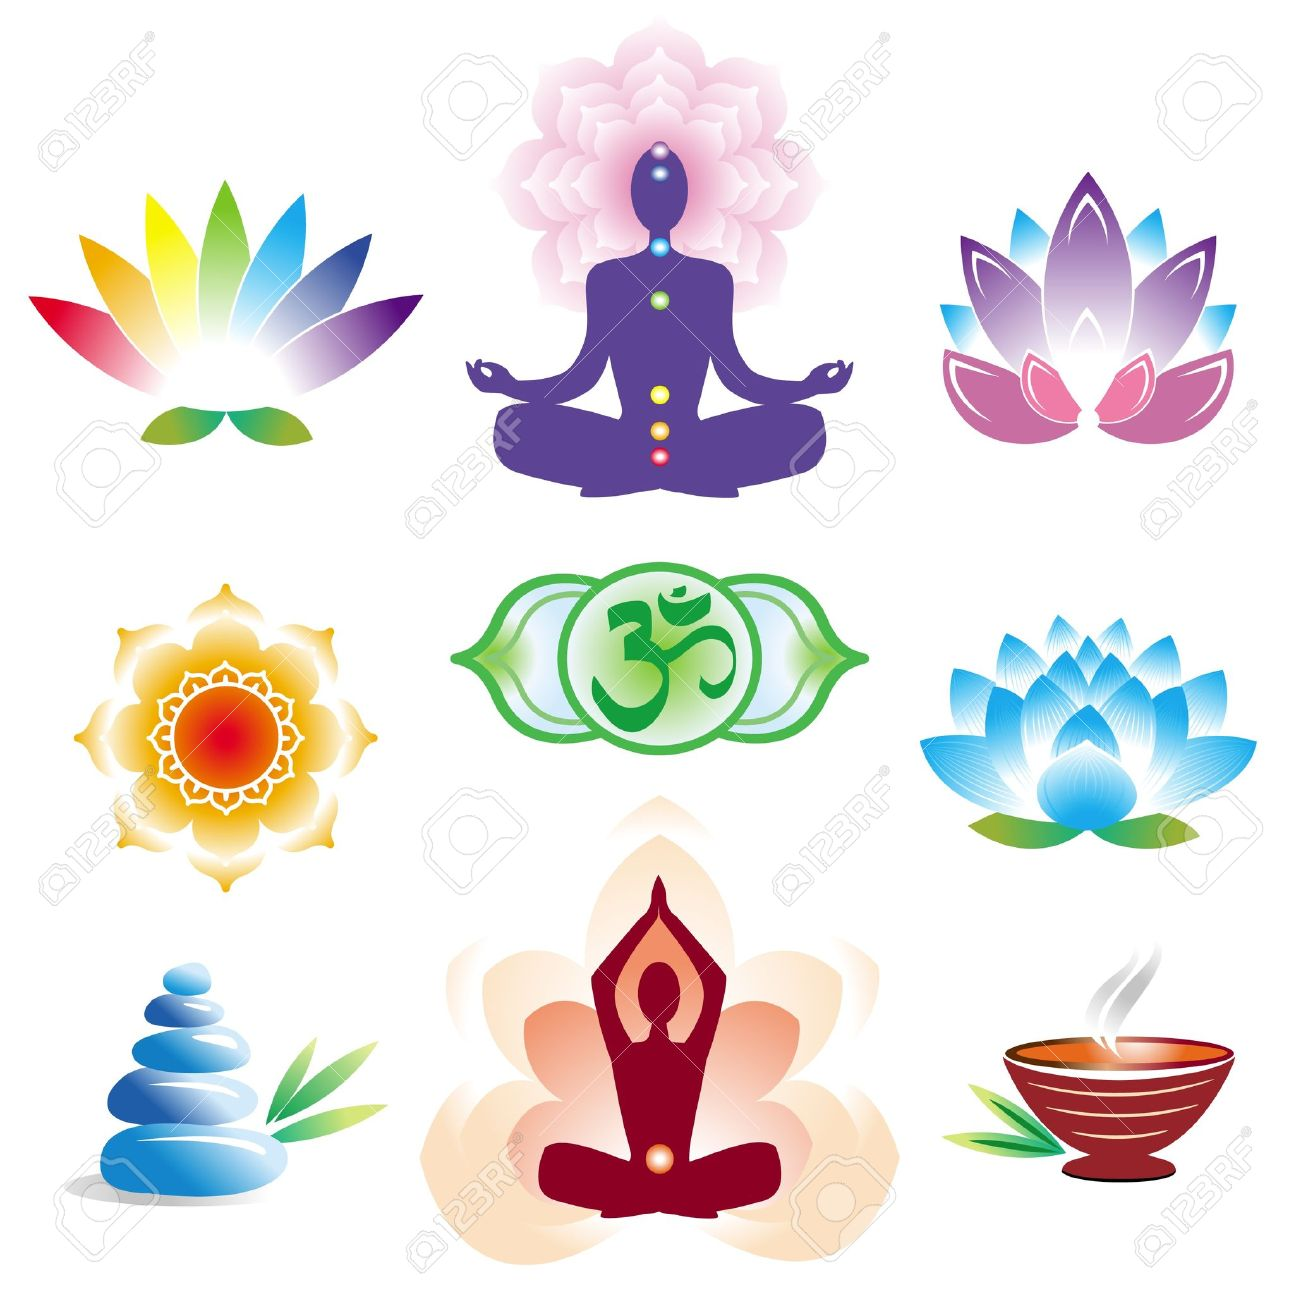 Hindu lotus flower stock photos pictures royalty free hindu hindu lotus flower oriental icons set illustration dhlflorist Gallery